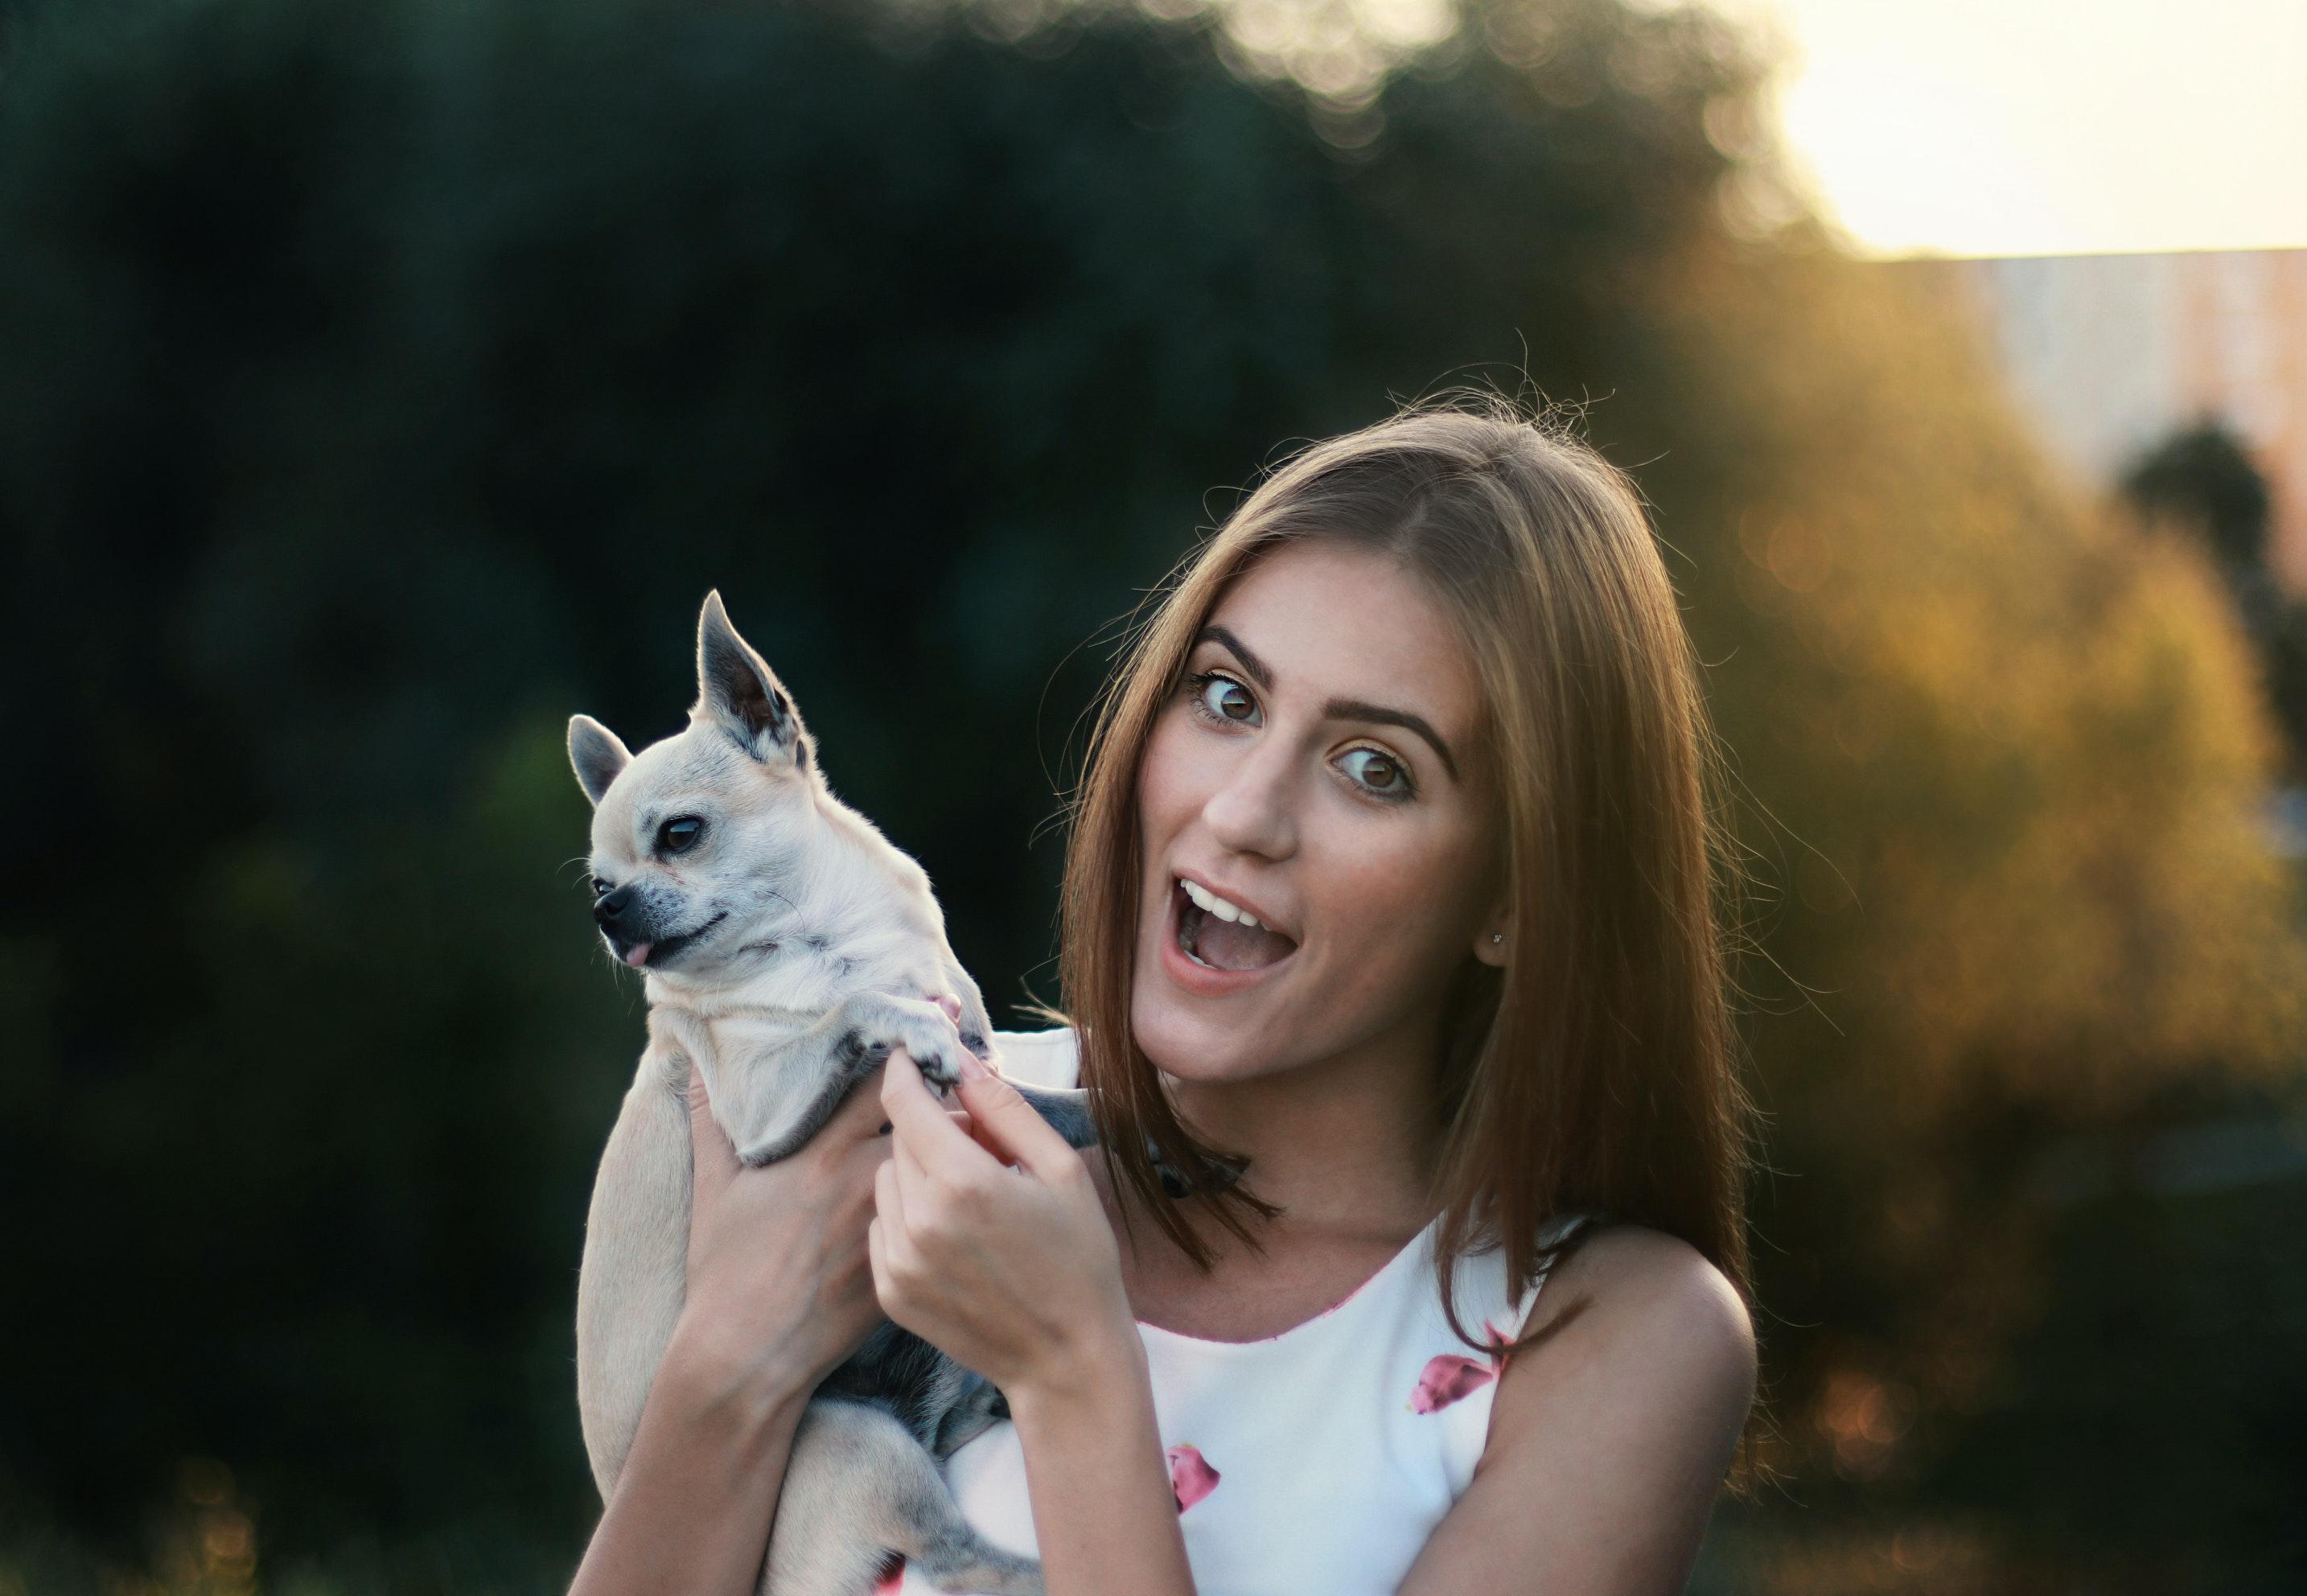 Desarrollar la resiliencia con tus mascotas bweb